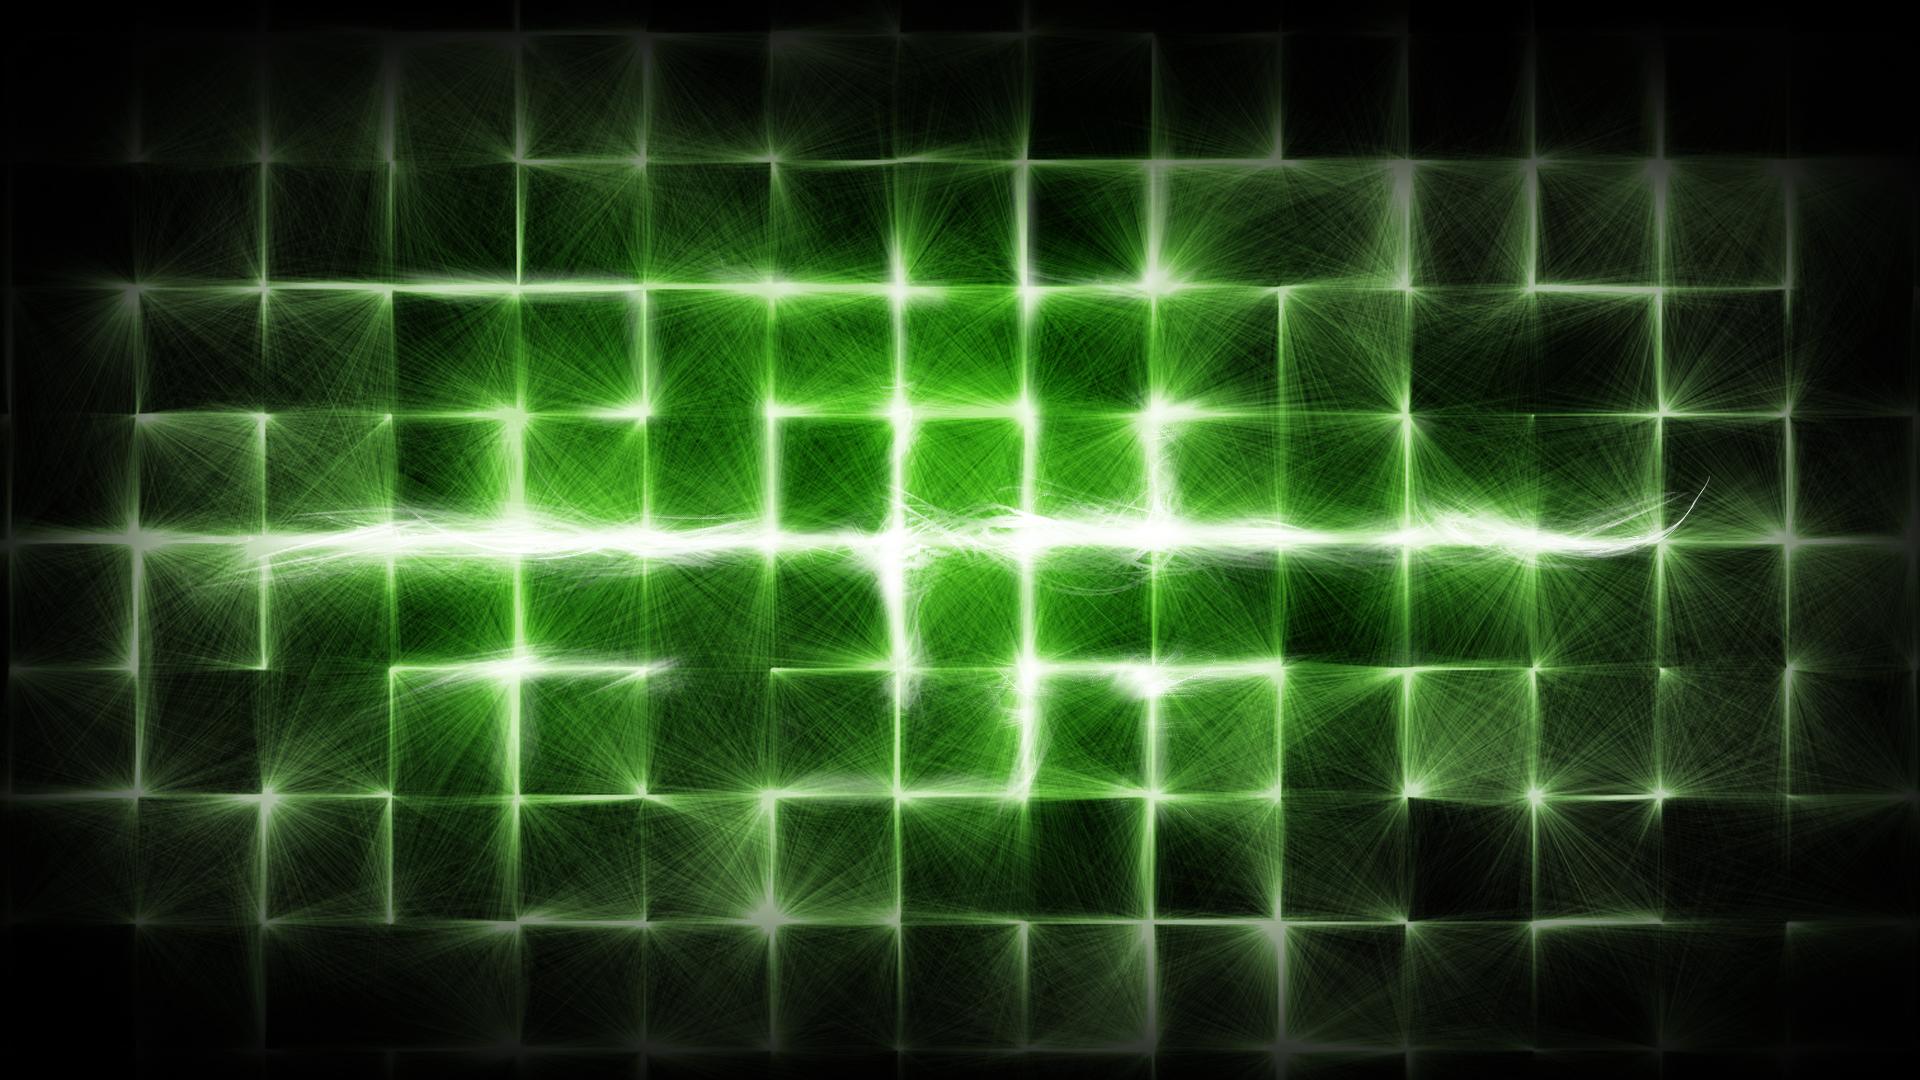 Light Grid Green Computer Wallpapers Desktop Backgrounds